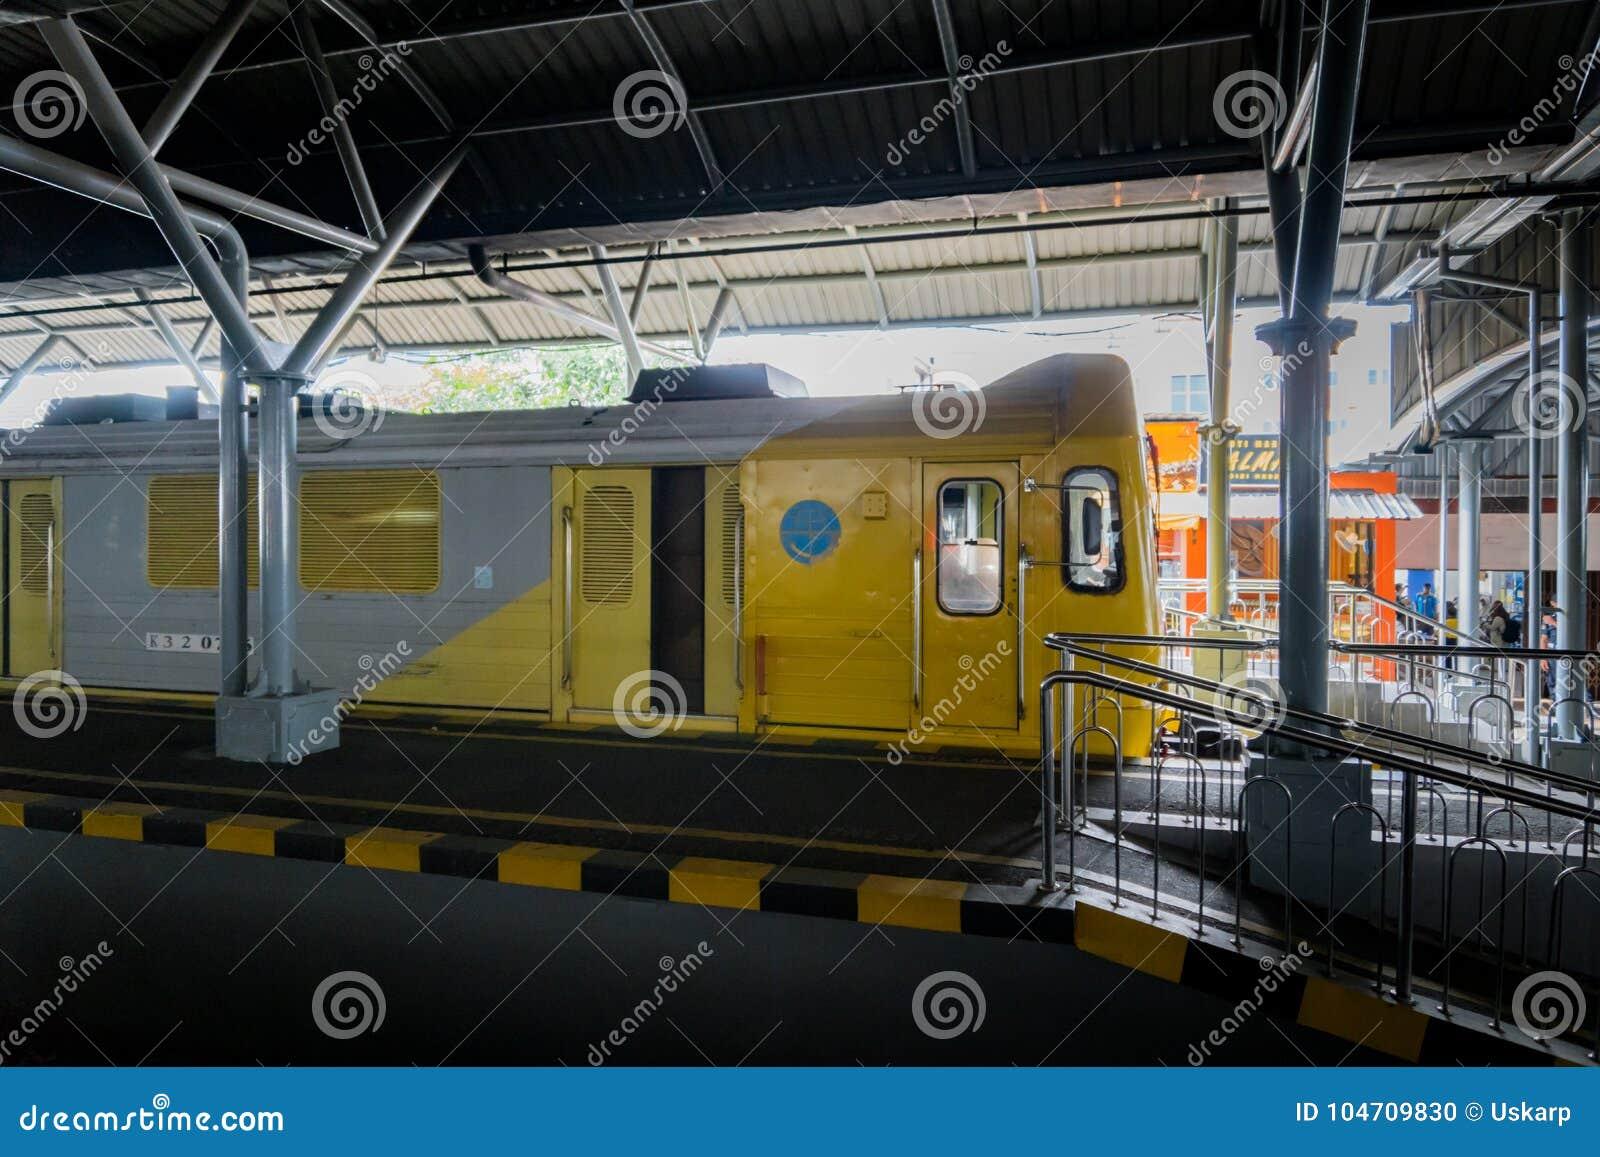 Train In Indonesia In Yogyakarta Operated By PT Kereta Api